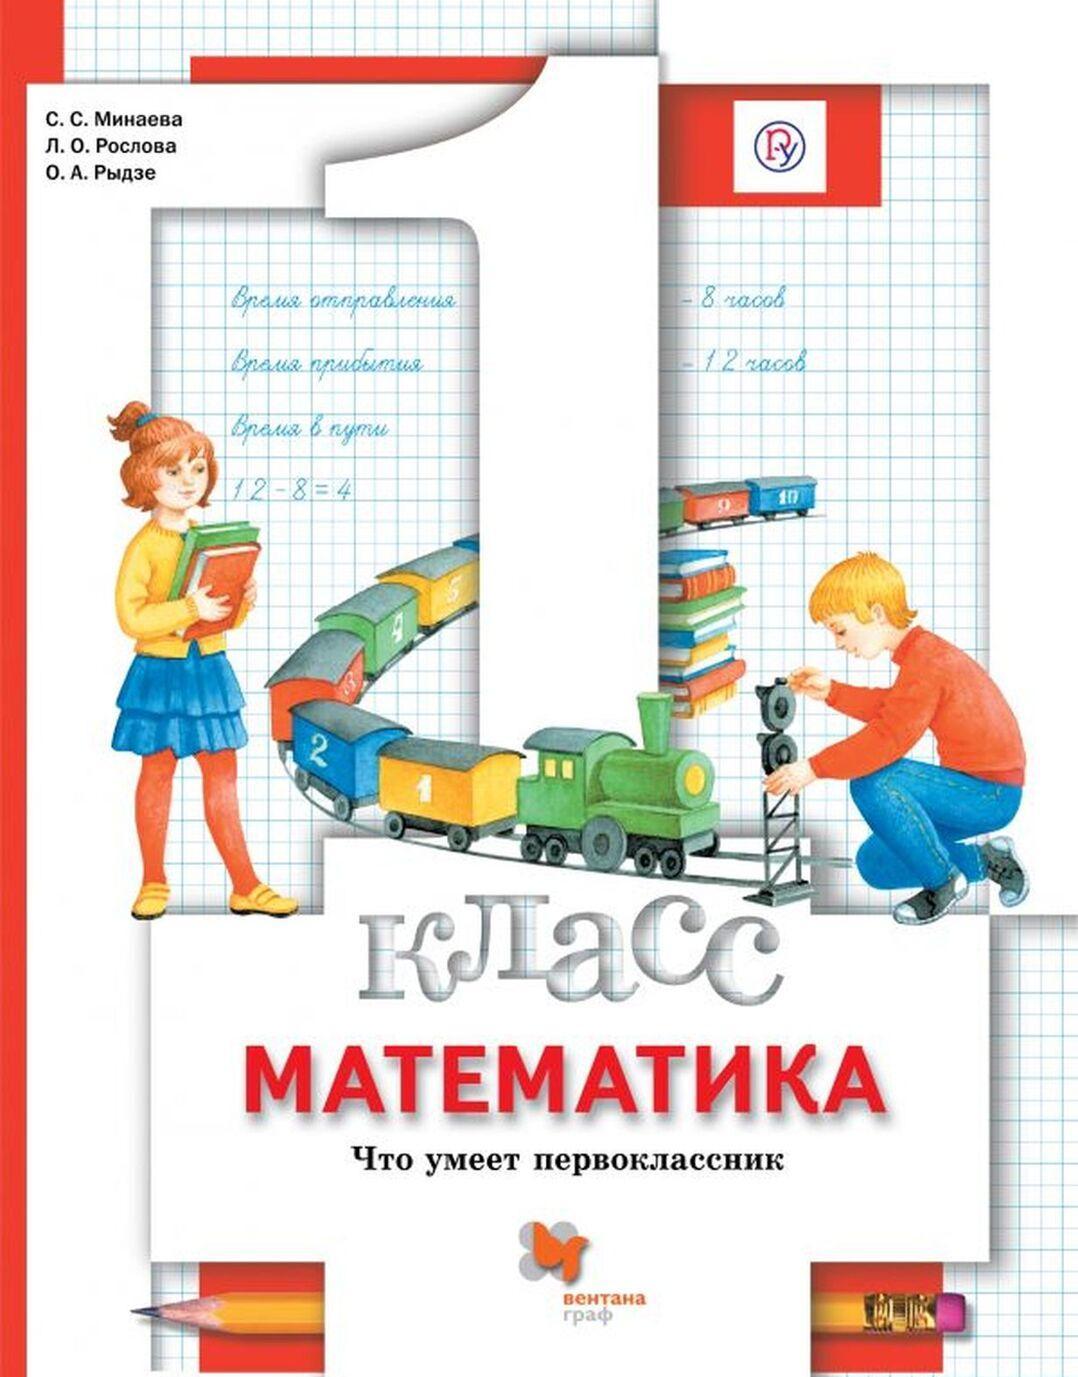 Matematika. Chto umeet pervoklassnik. 1 klass. Tetrad dlja proverochnykh rabot